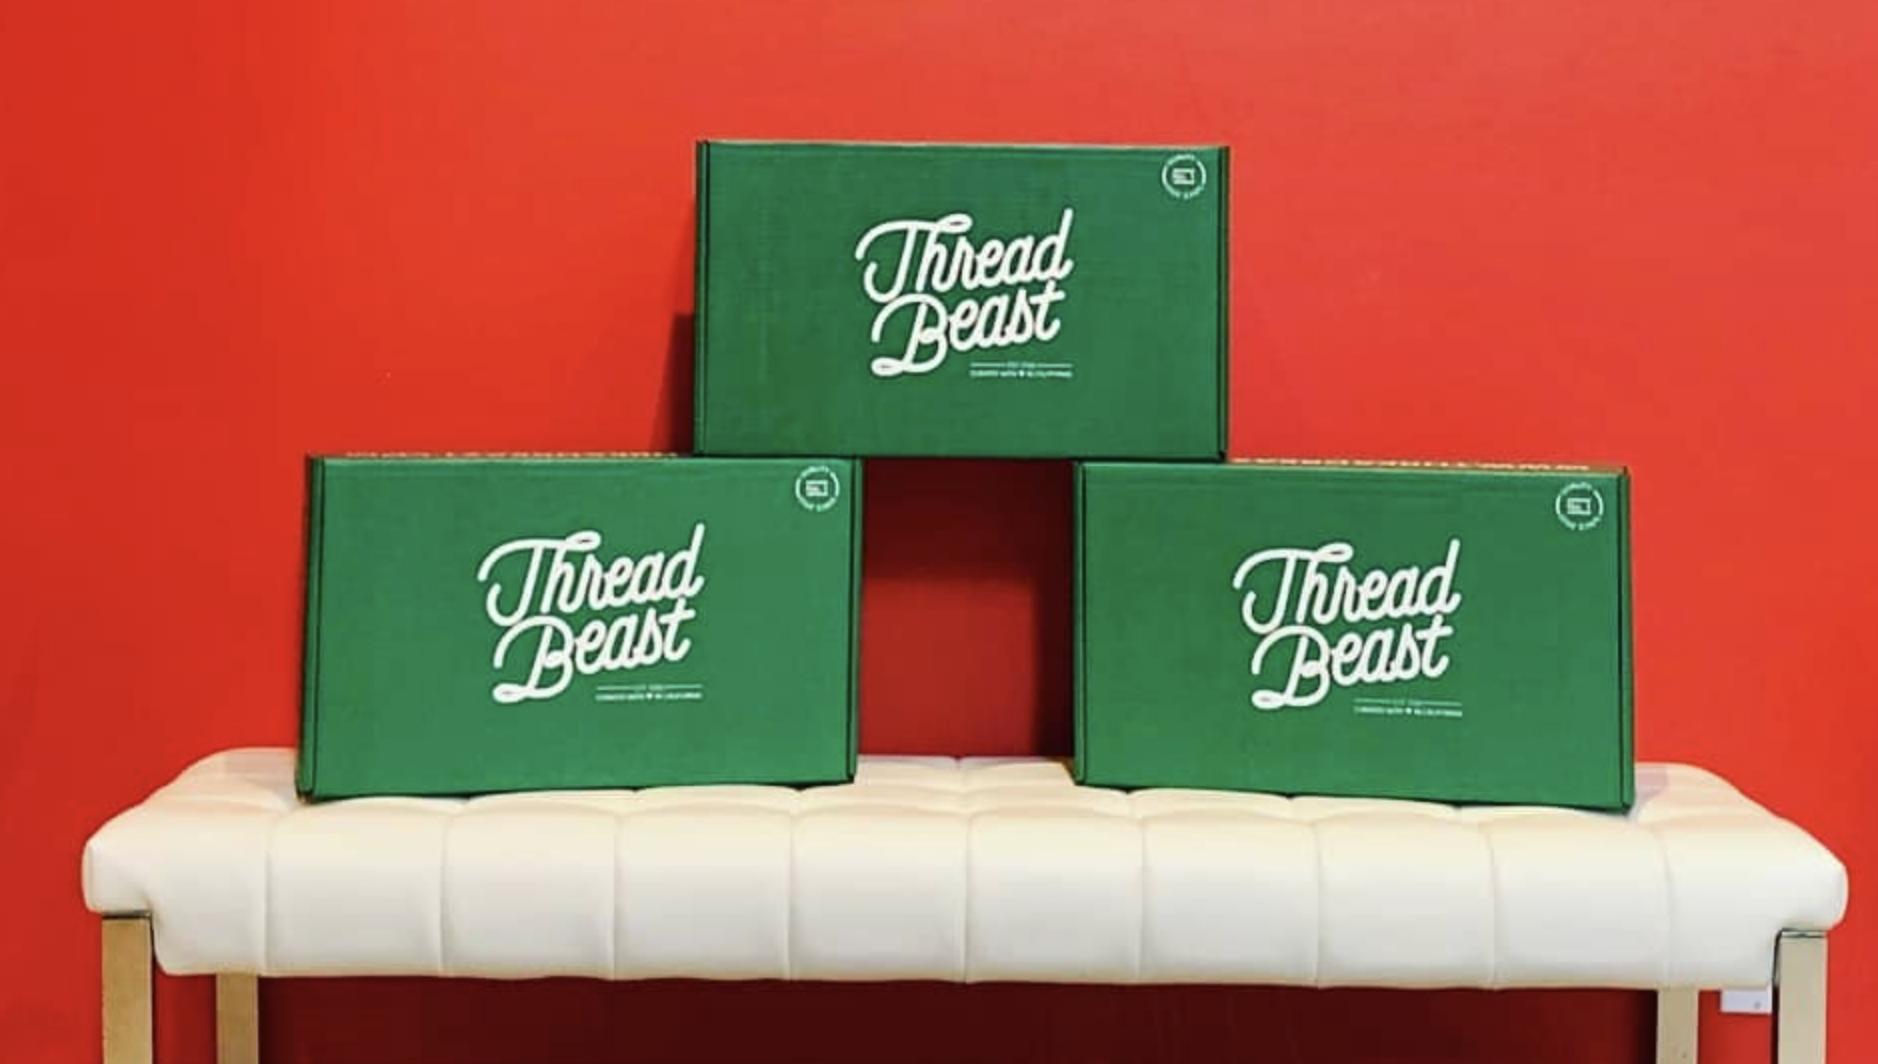 A ThreadBeast Holiday